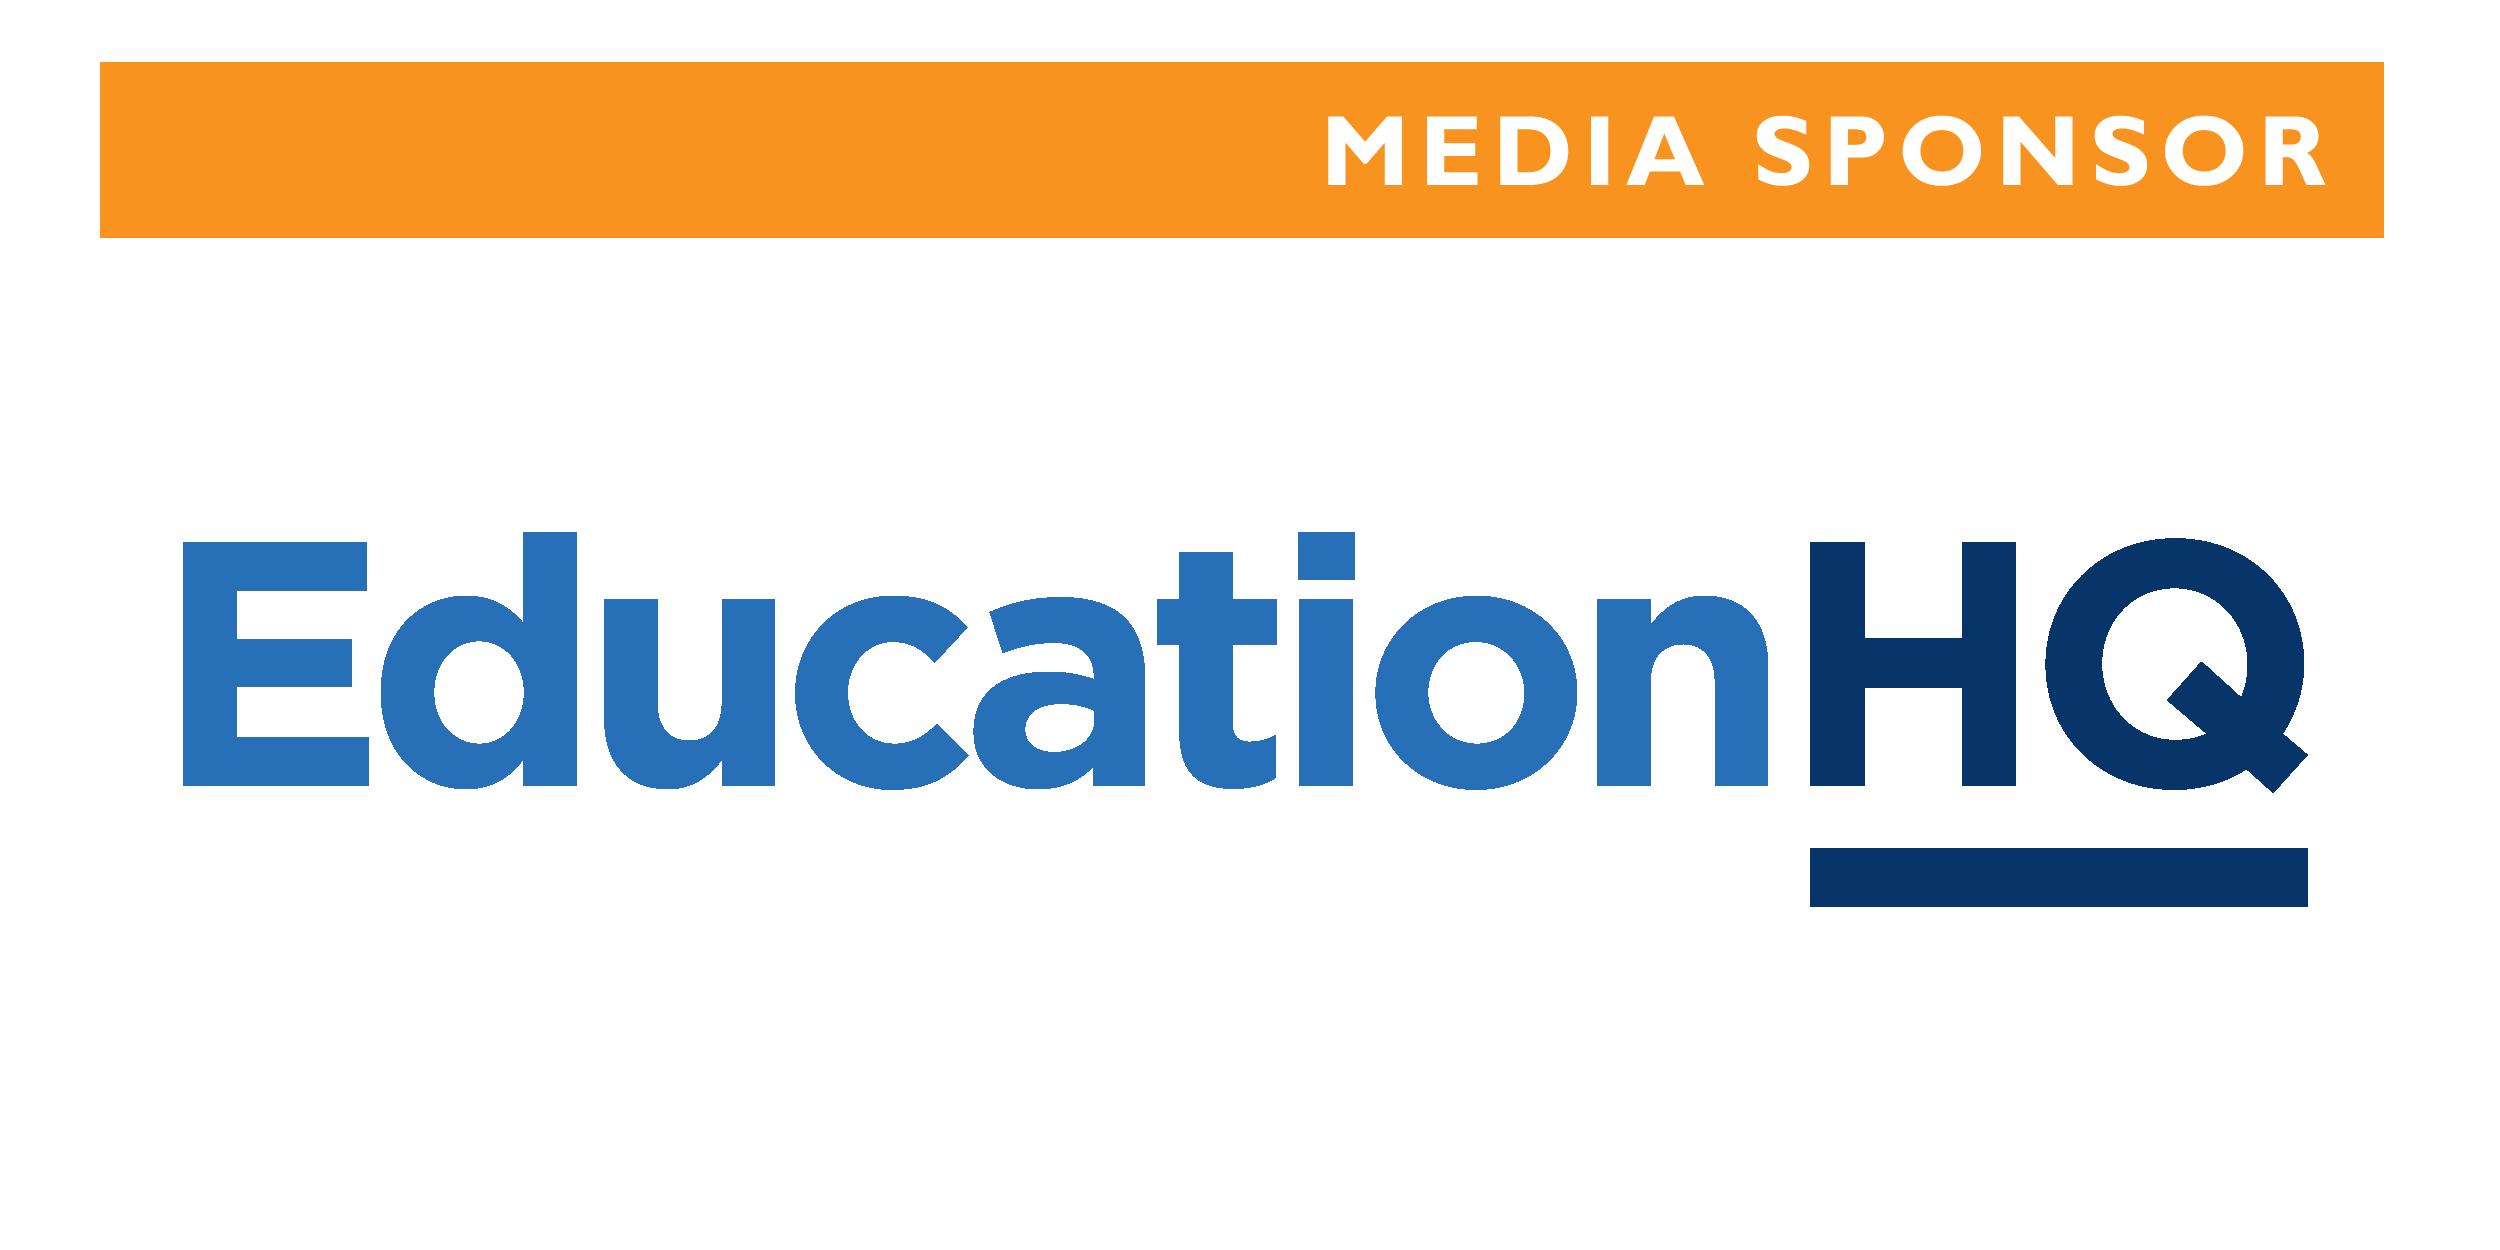 Education HQ